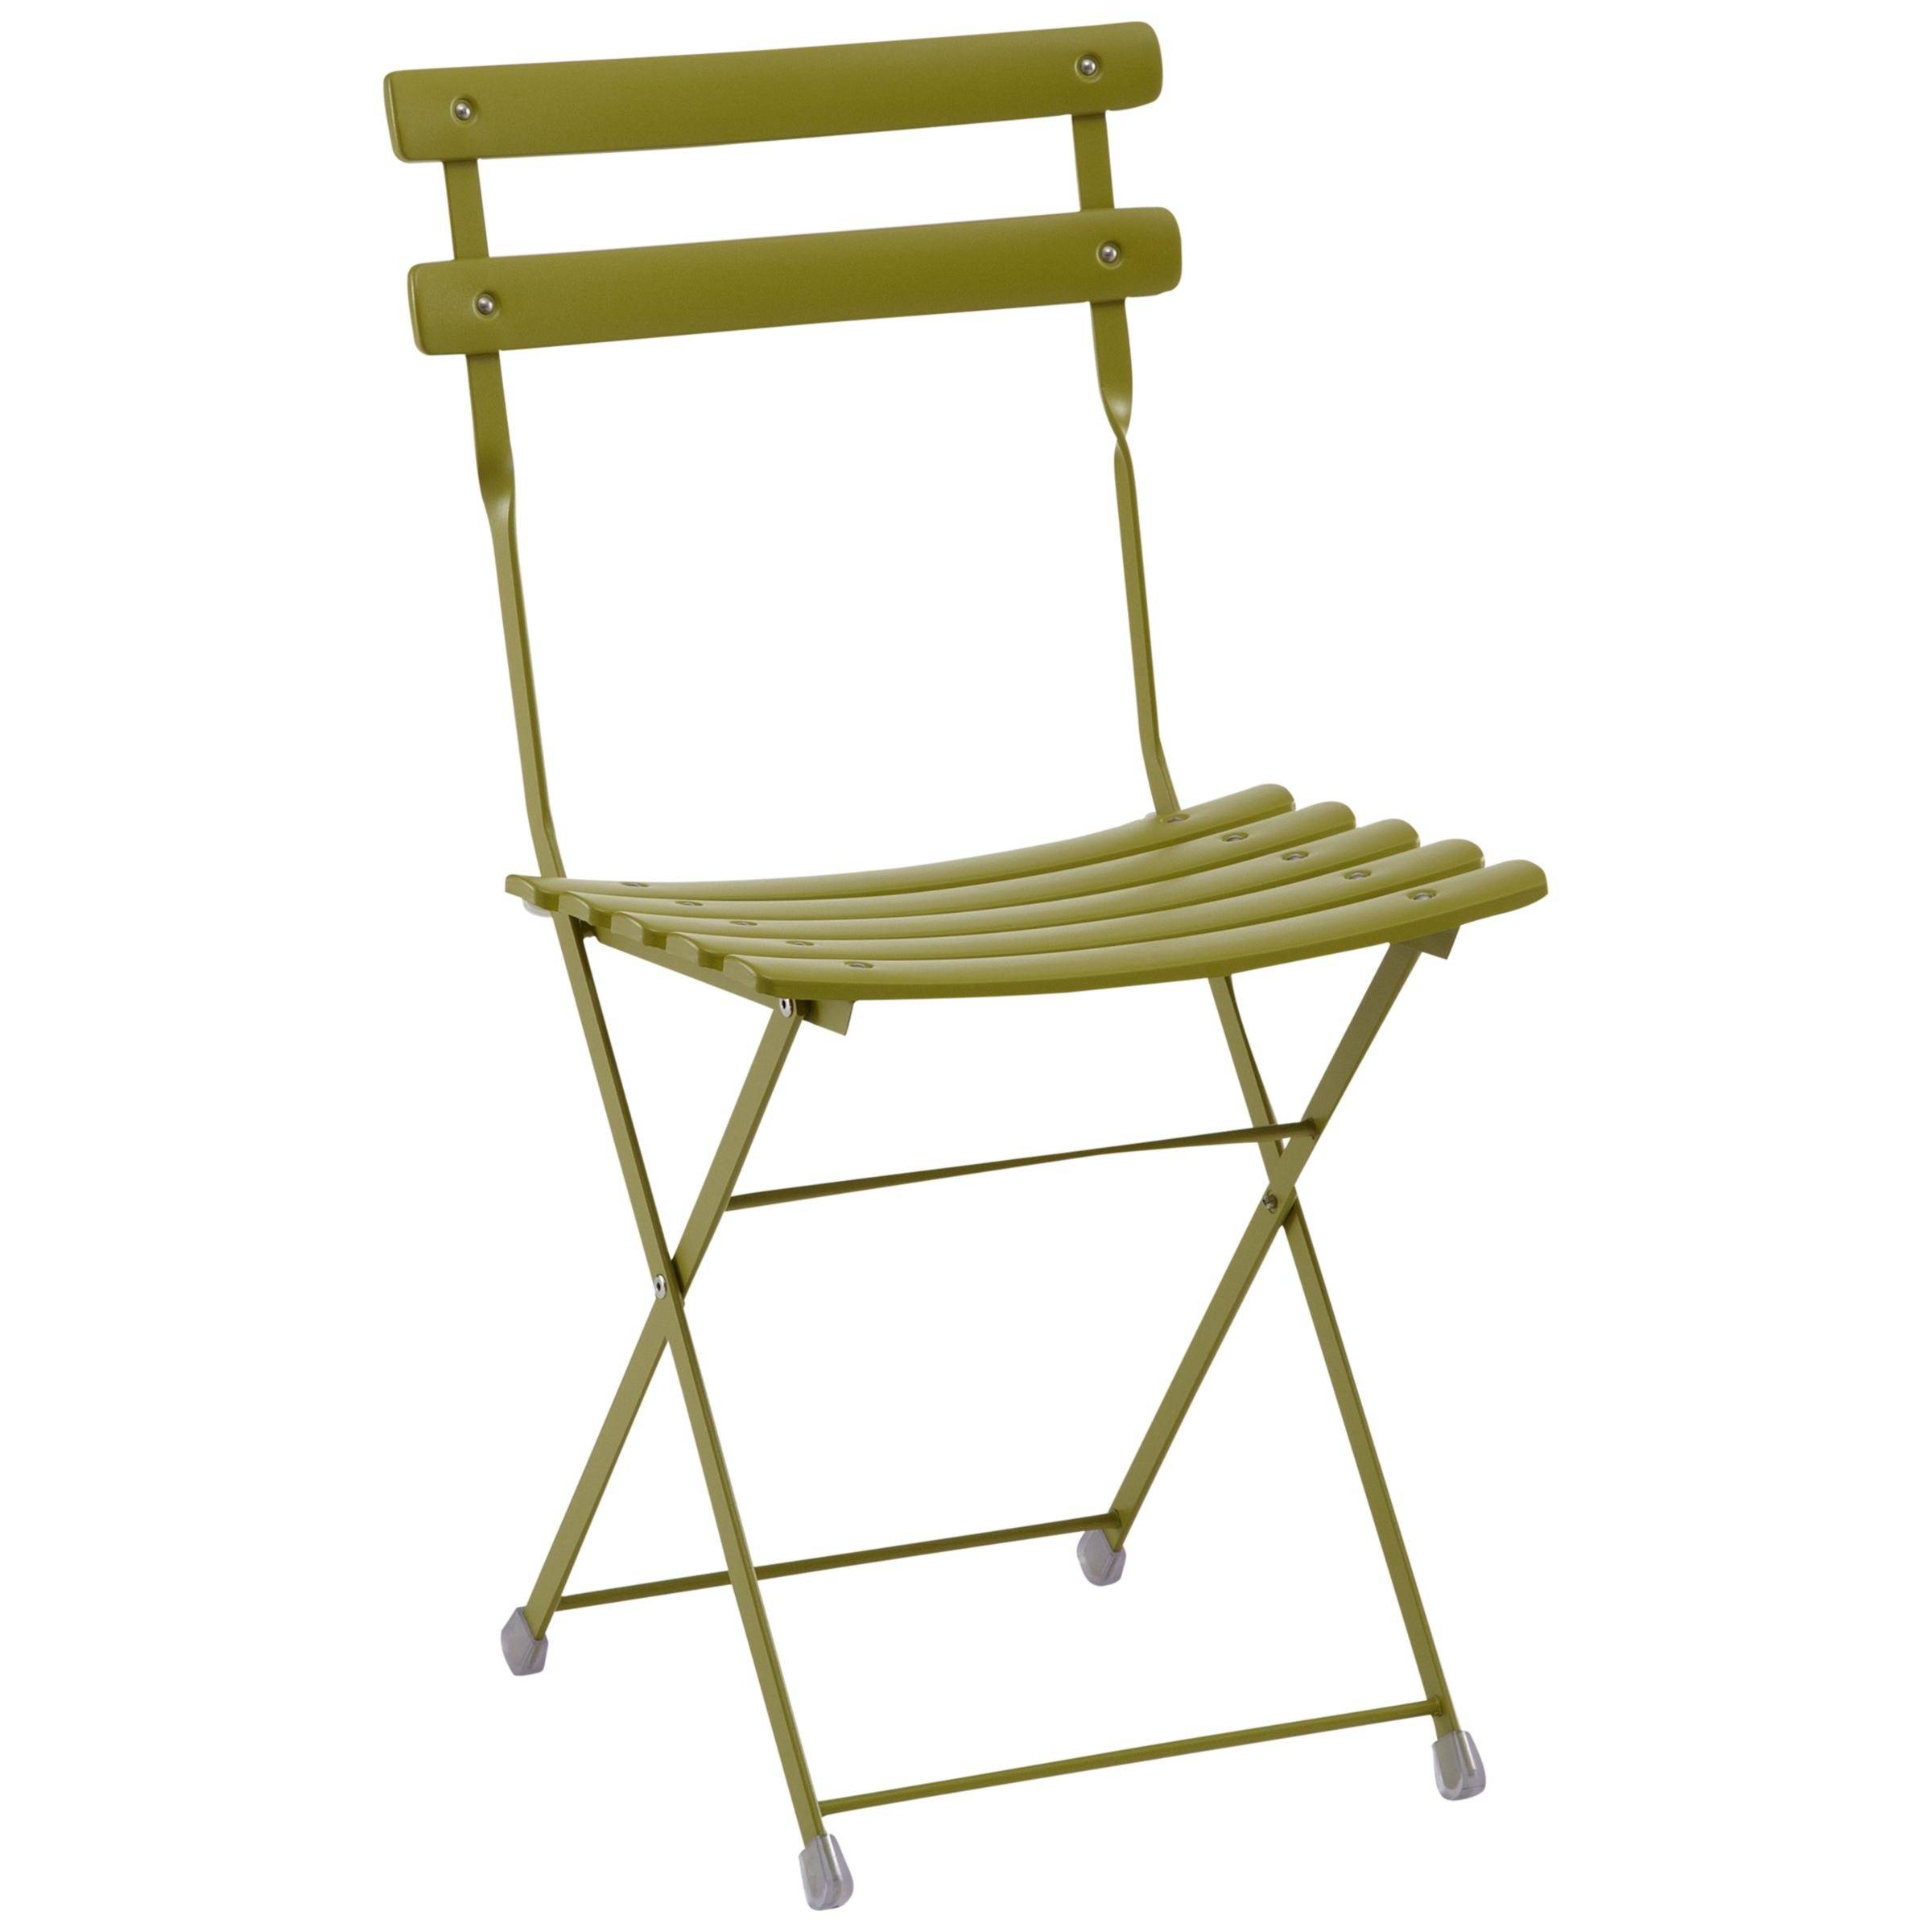 EMU Arc En Ciel Outdoor Chairs, Set of 2, Green